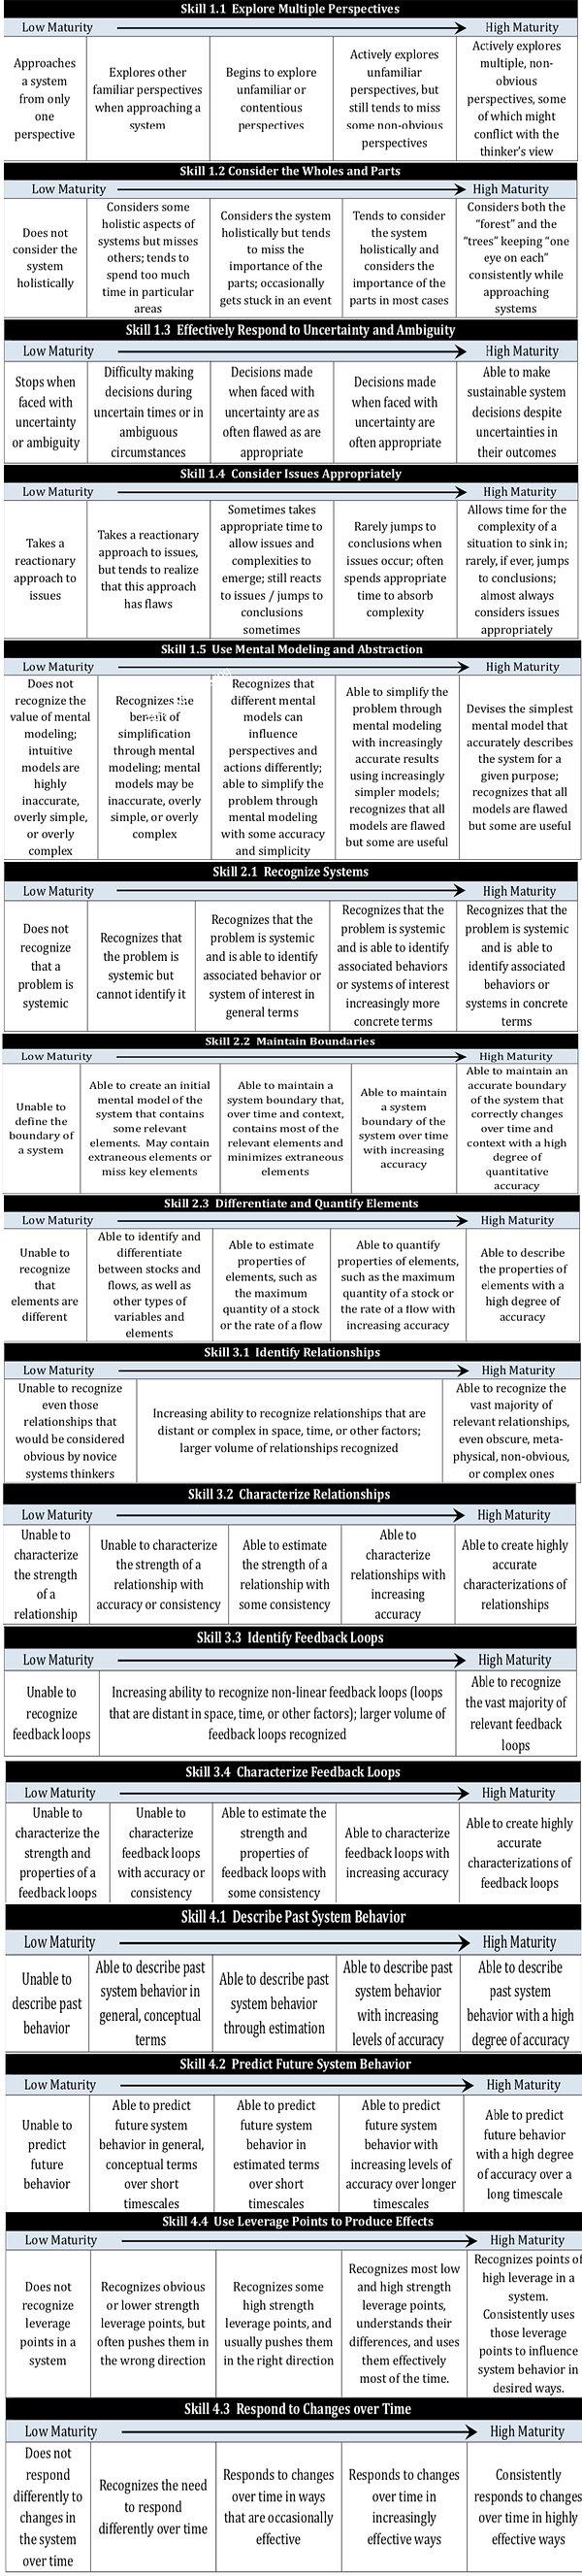 Systems Thinking Rubrics.jpg